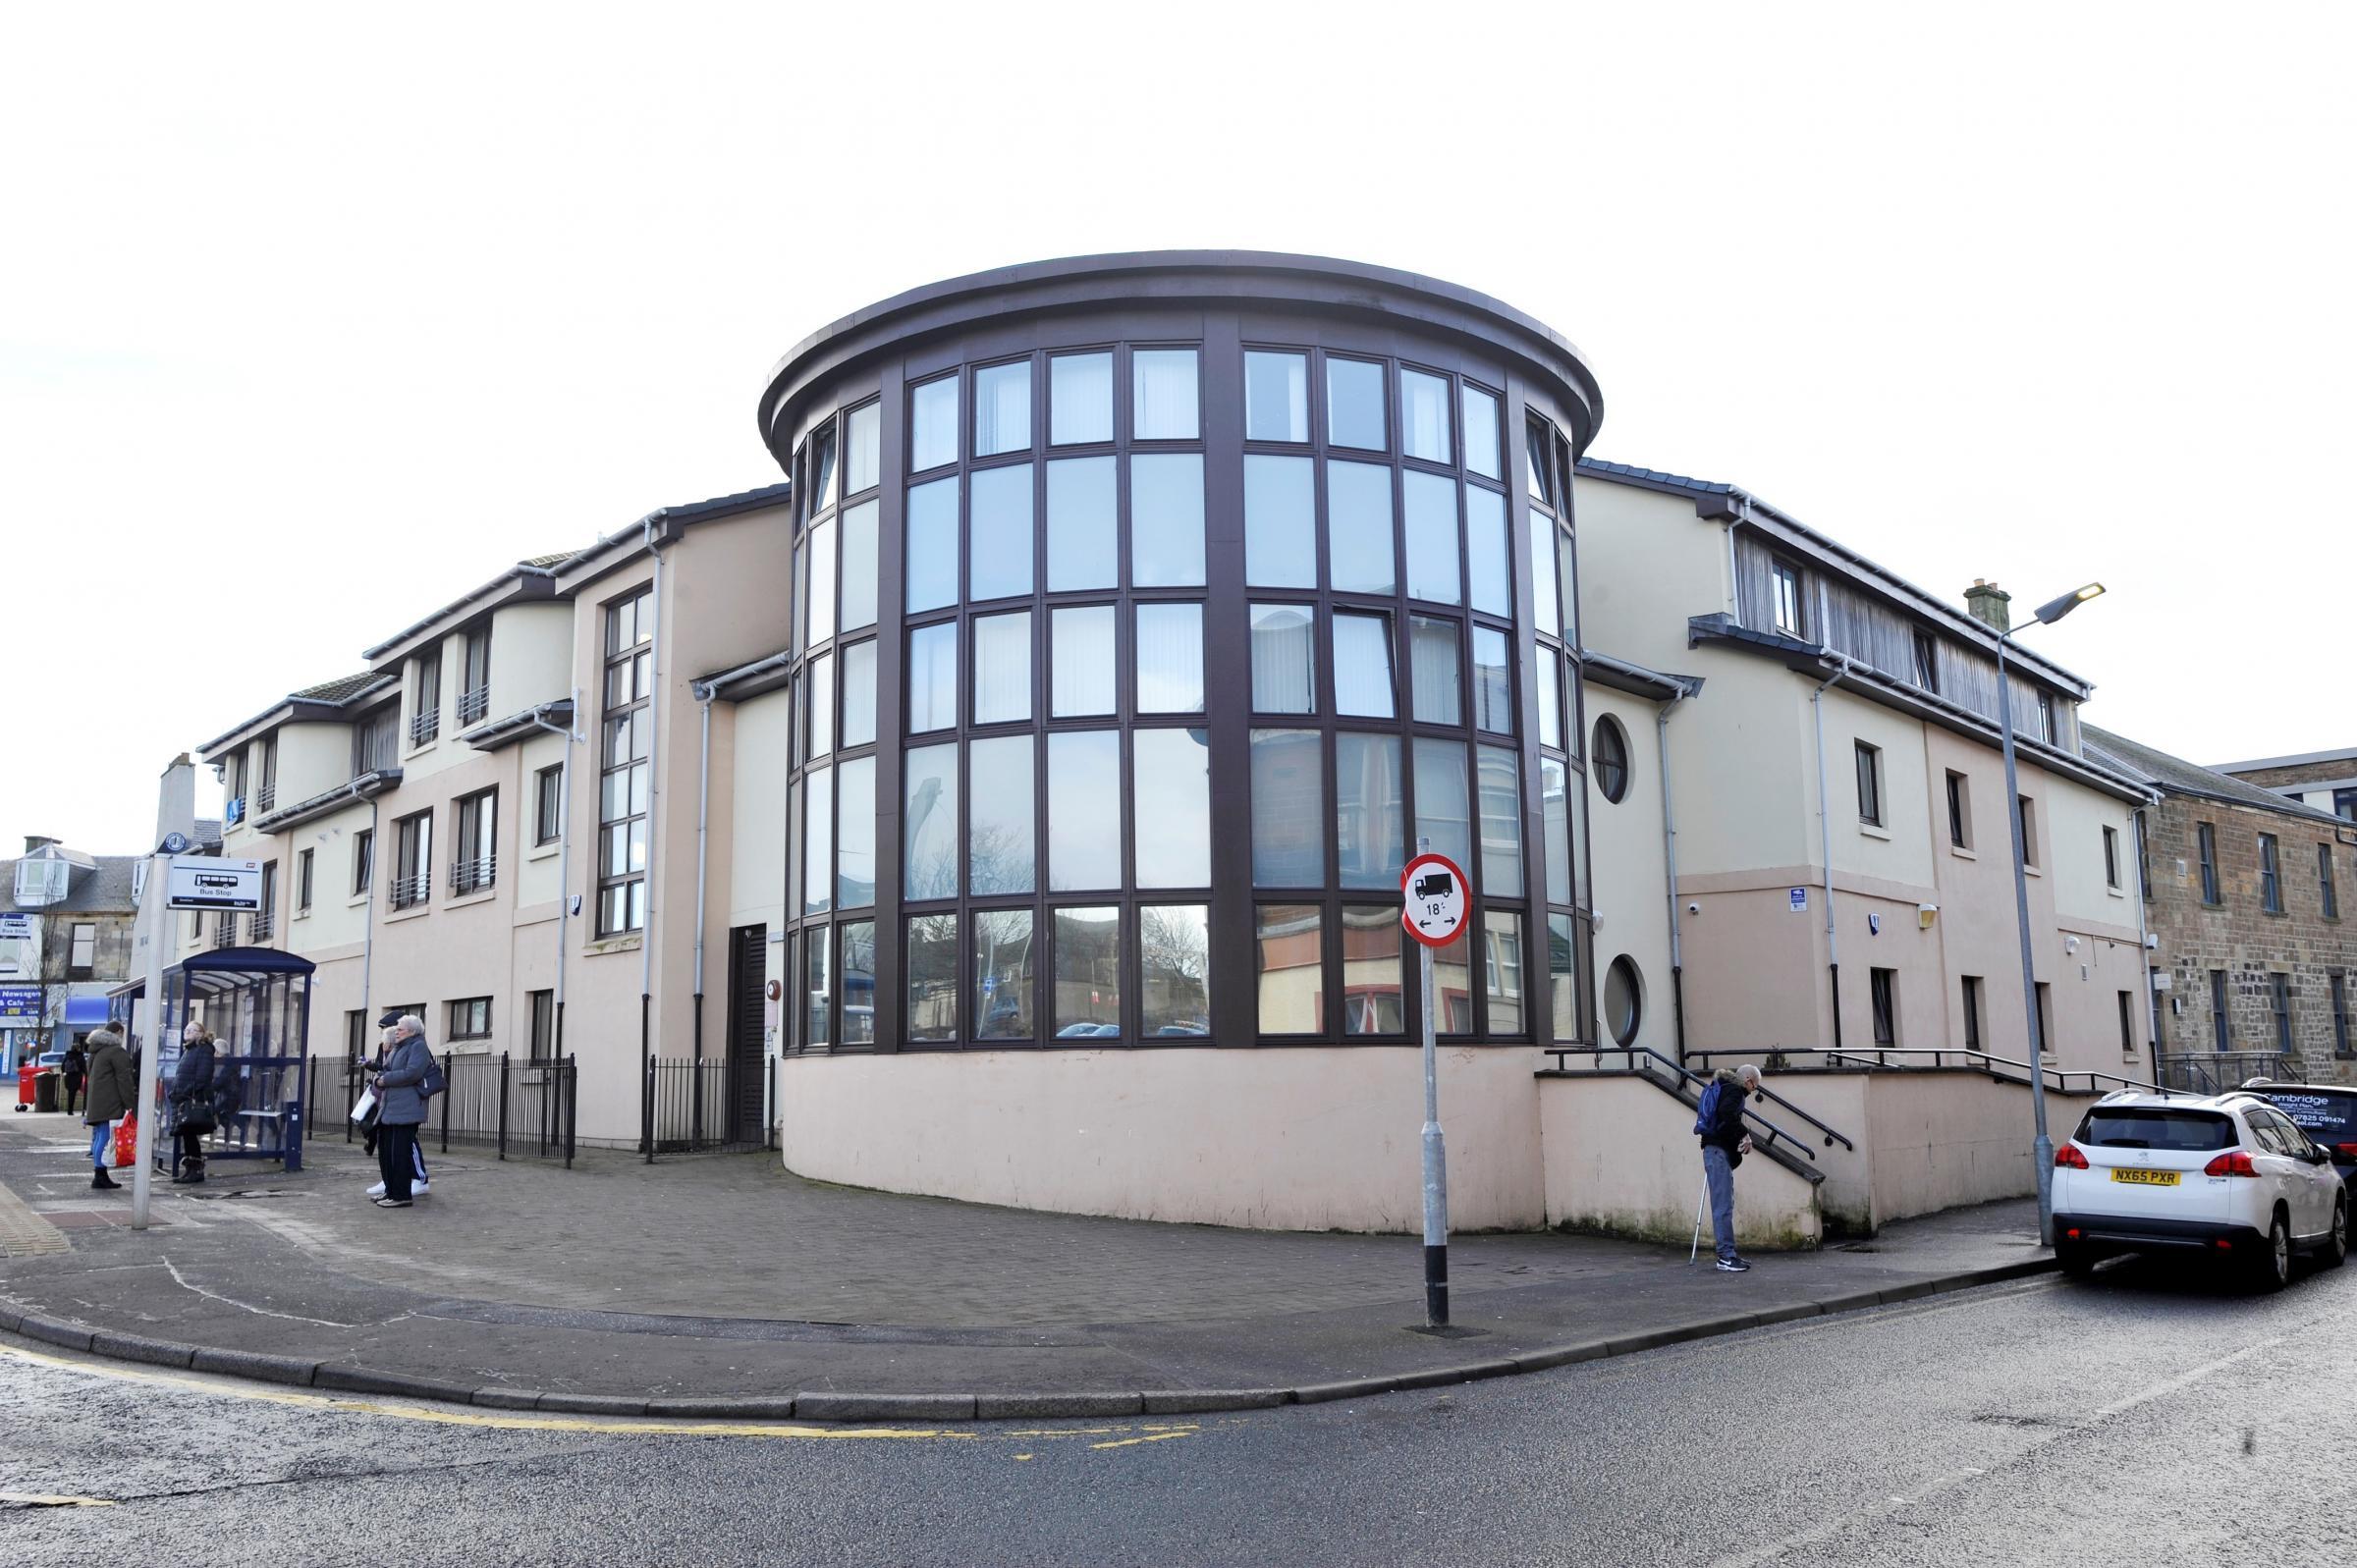 NAC announces Saltcoats homeless hostel closure